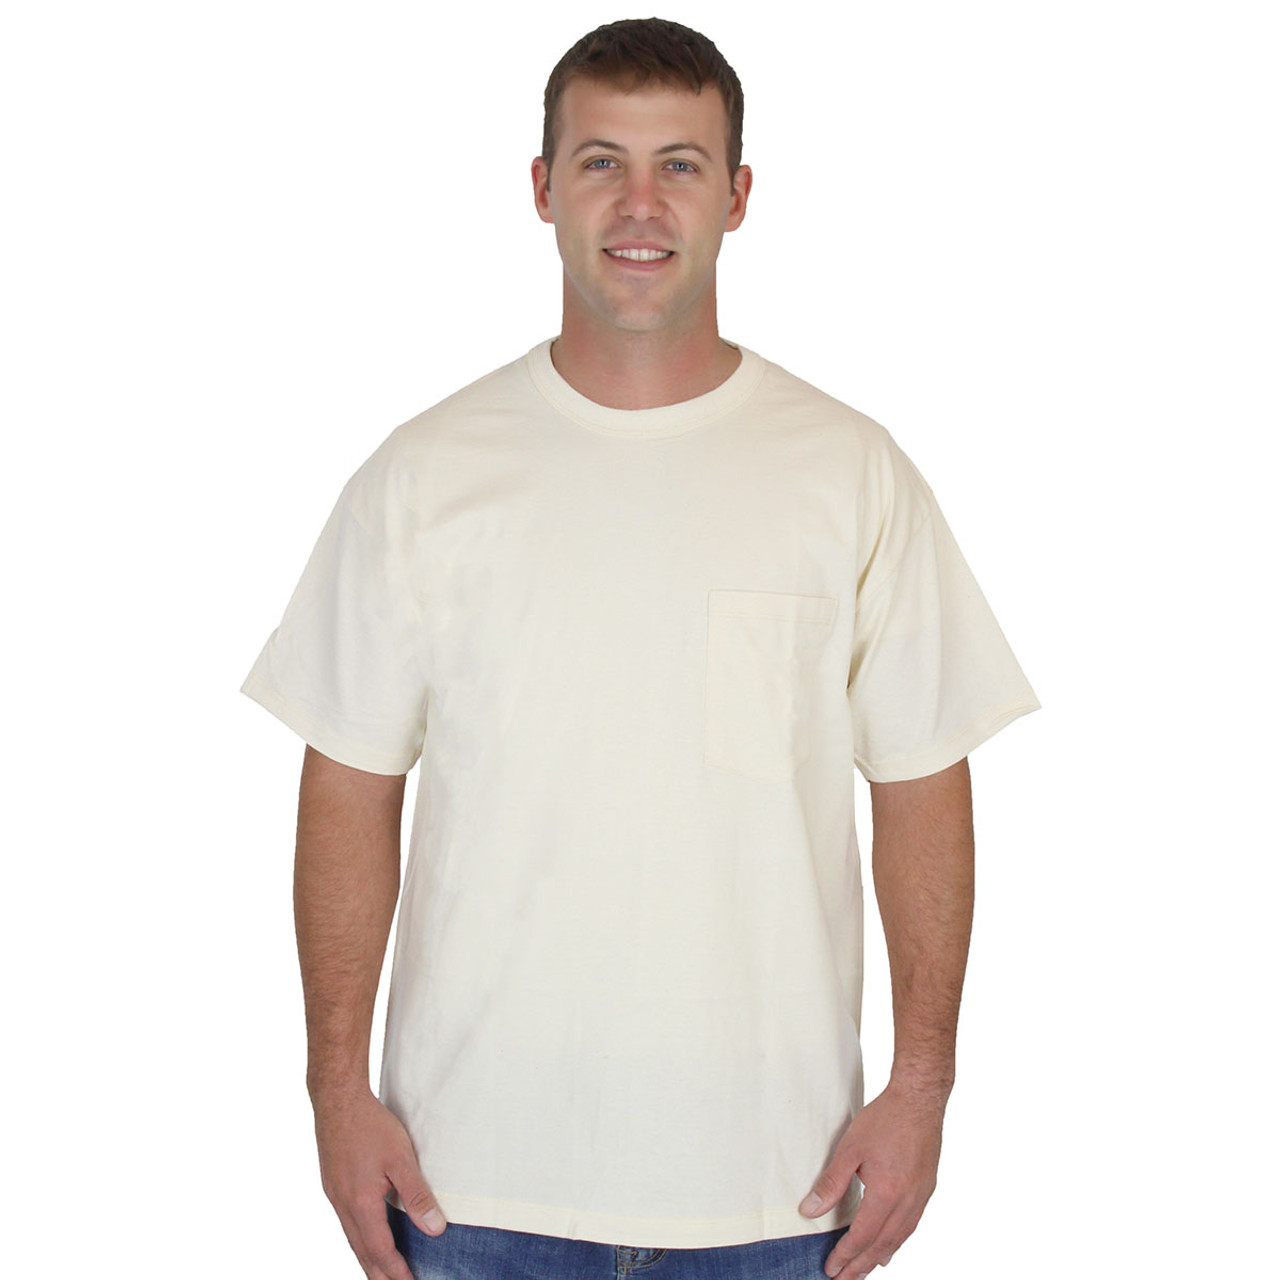 Womens Sage 100/% Organic Cotton Crewneck Tee Shirt Hypoallergenic USA MADE